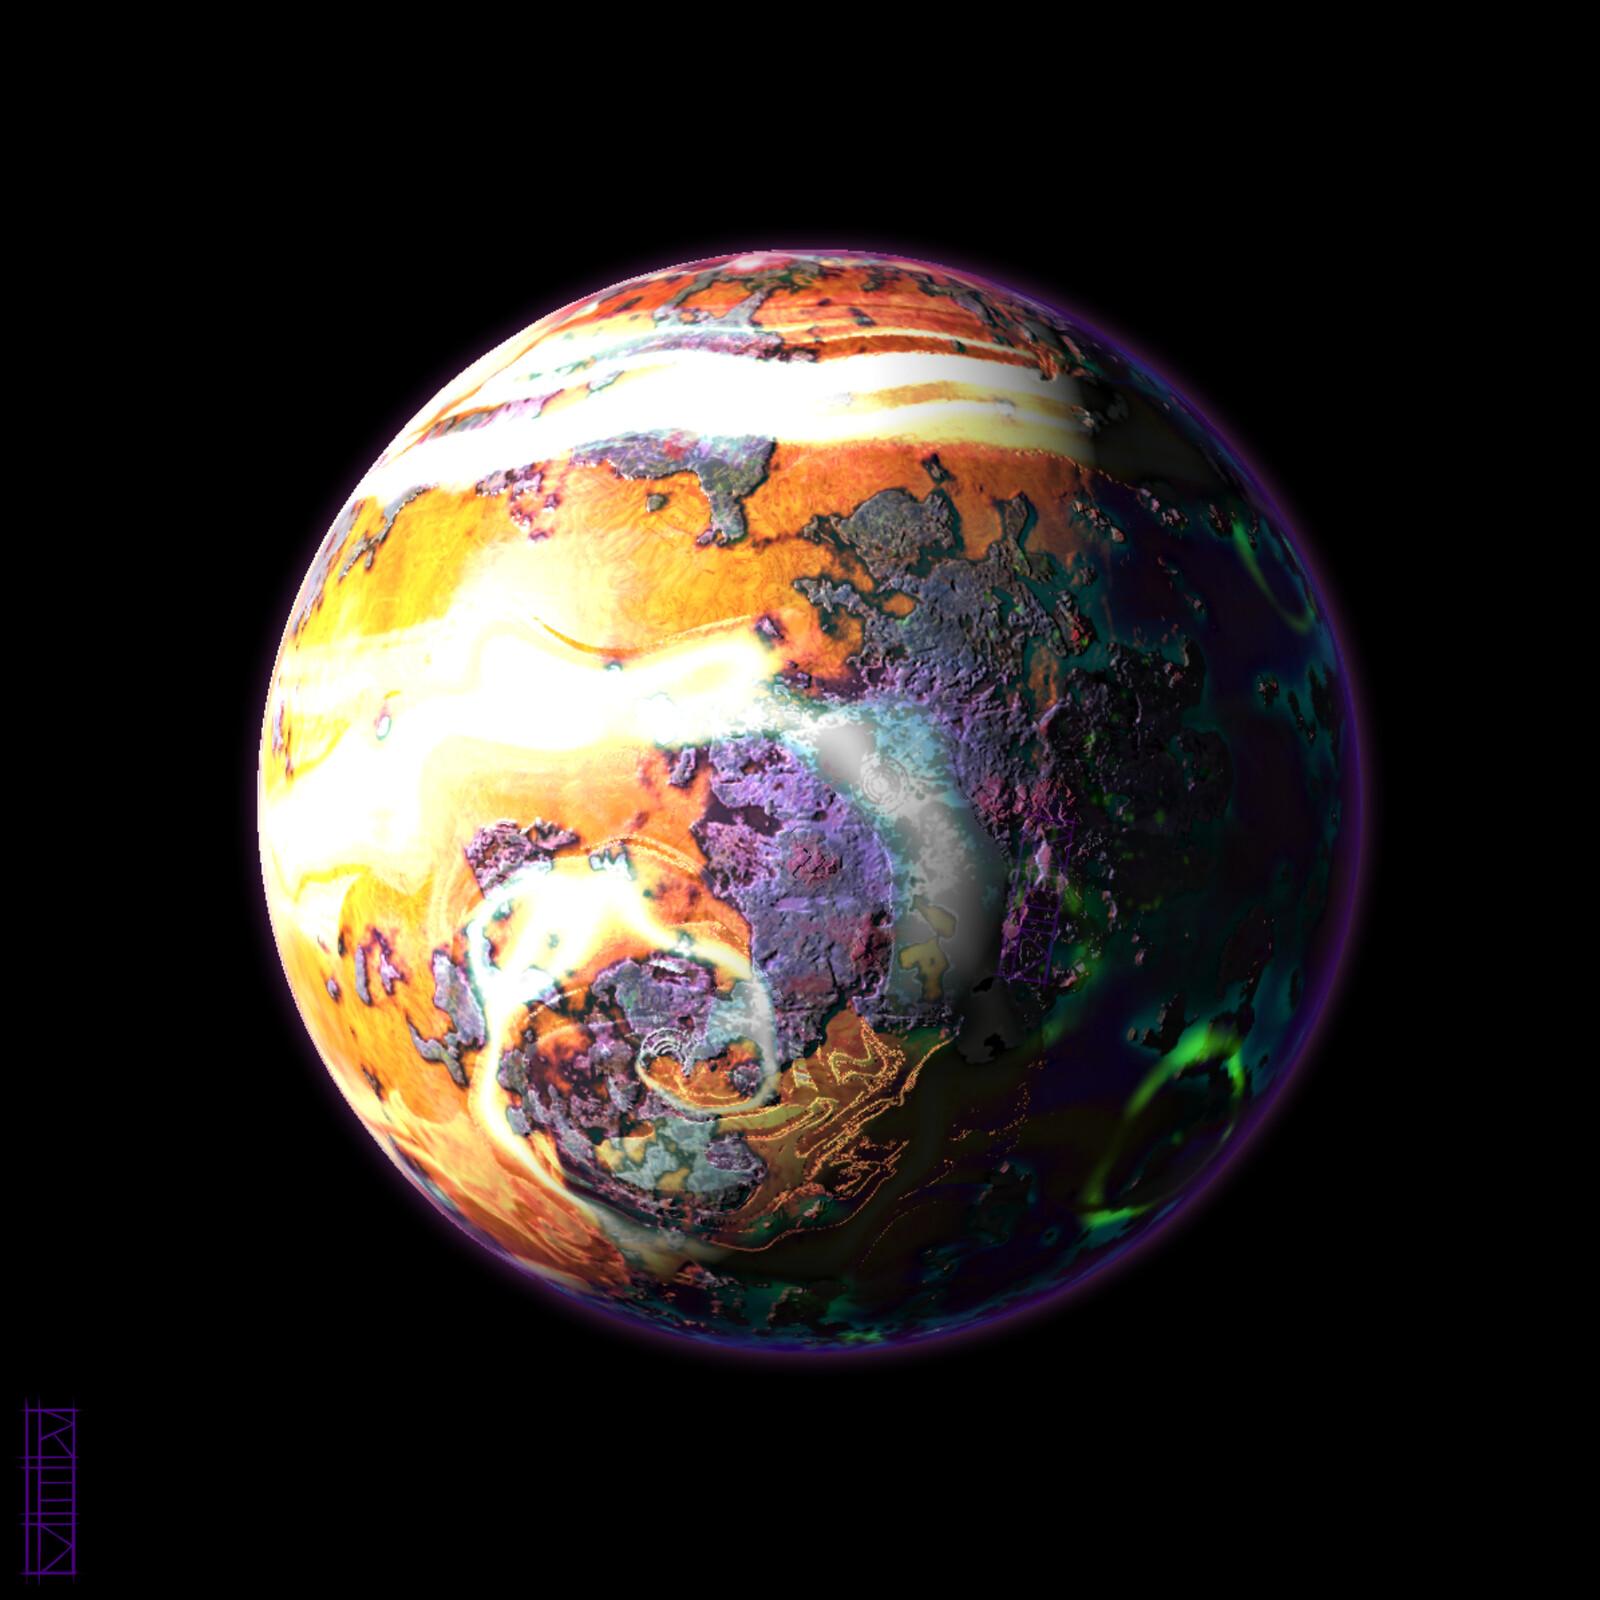 Planet Tycho